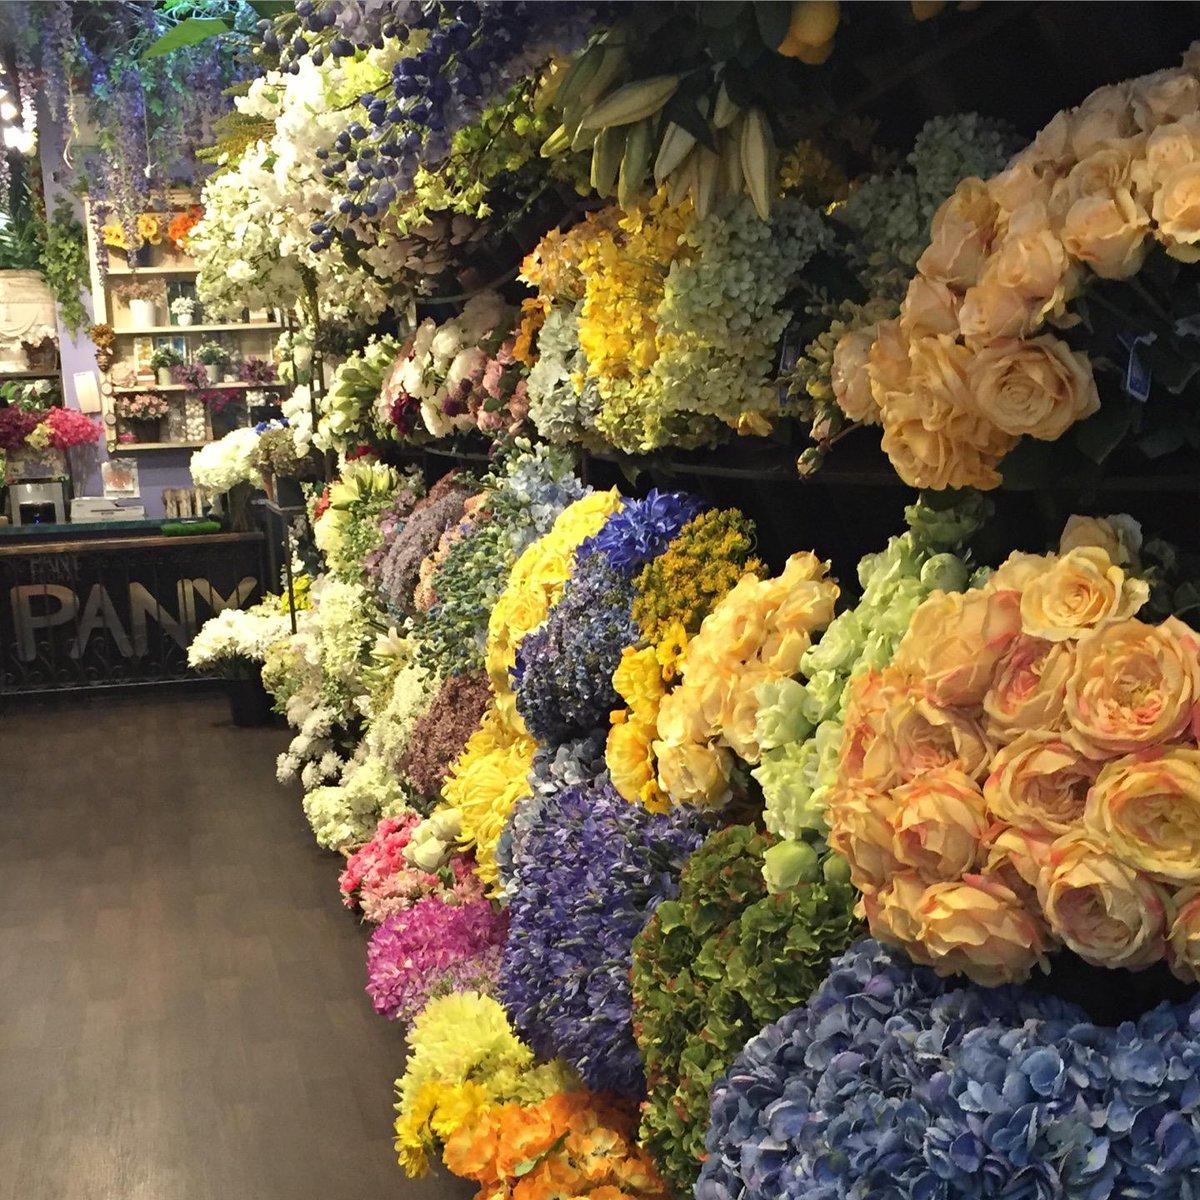 Casey Blackwood On Twitter Im At Pany Silk Flowers In New York